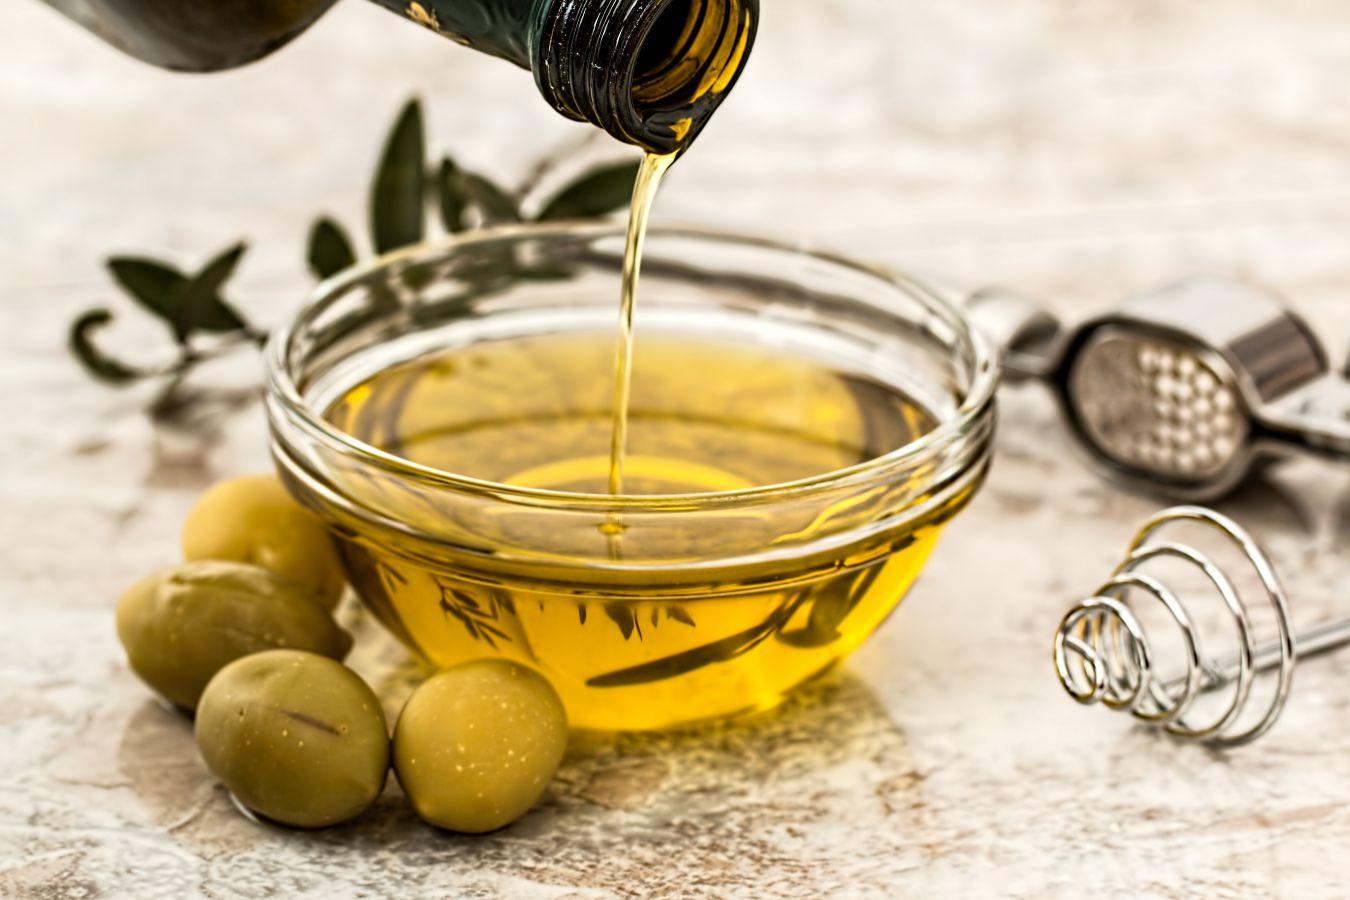 Mainpicture olijfolie